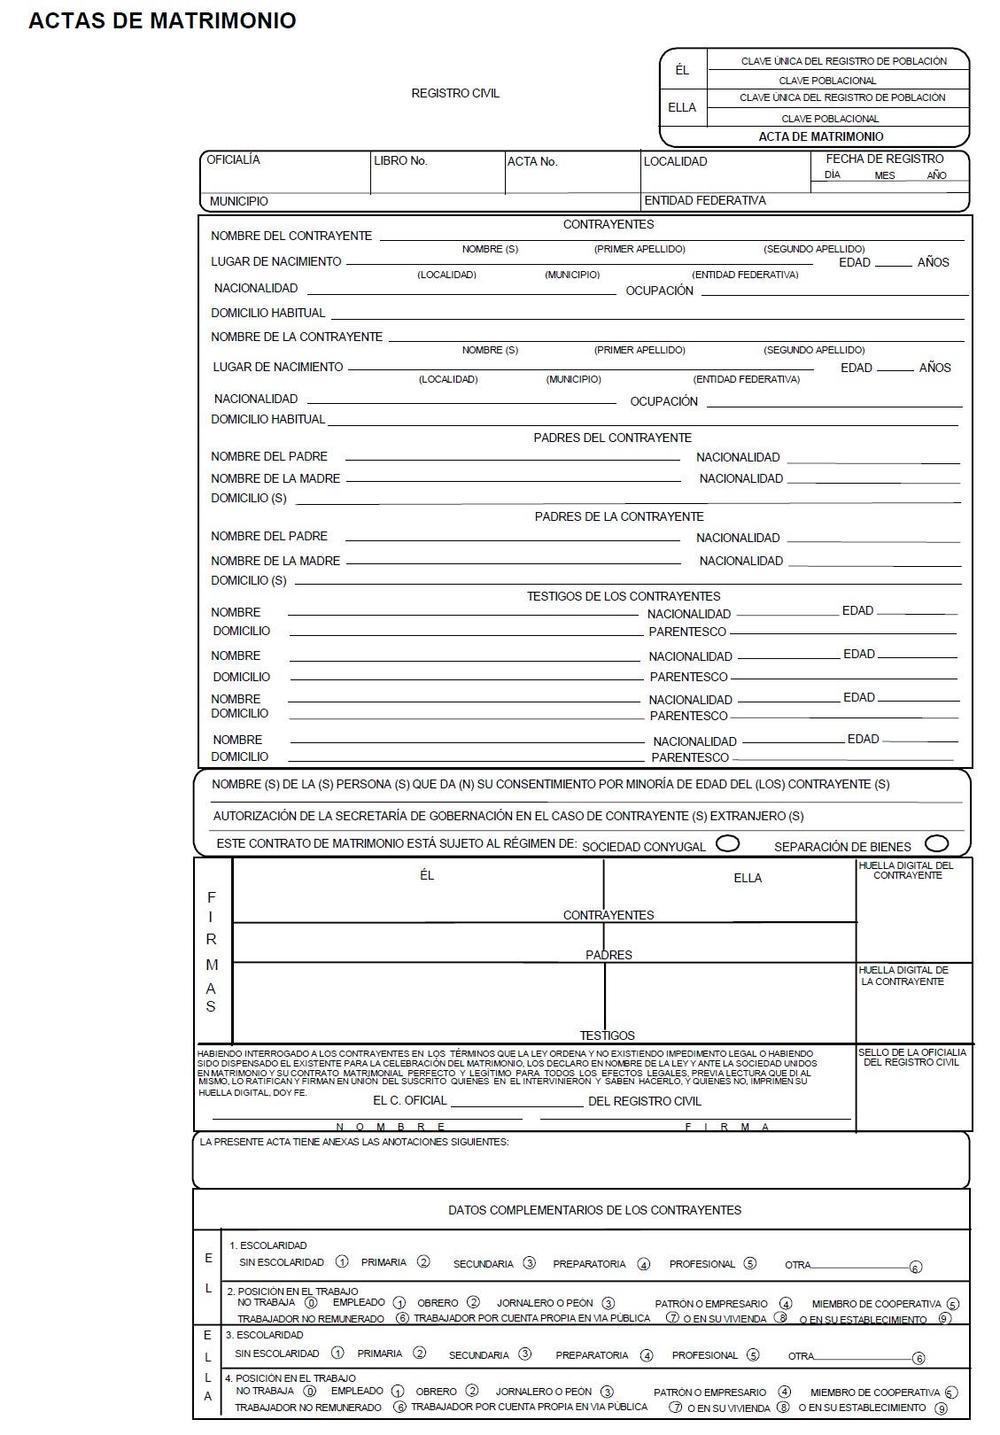 Formato De Acta De Matrimonio Acta De Matrimonio Matrimonio Certificado De Matrimonio